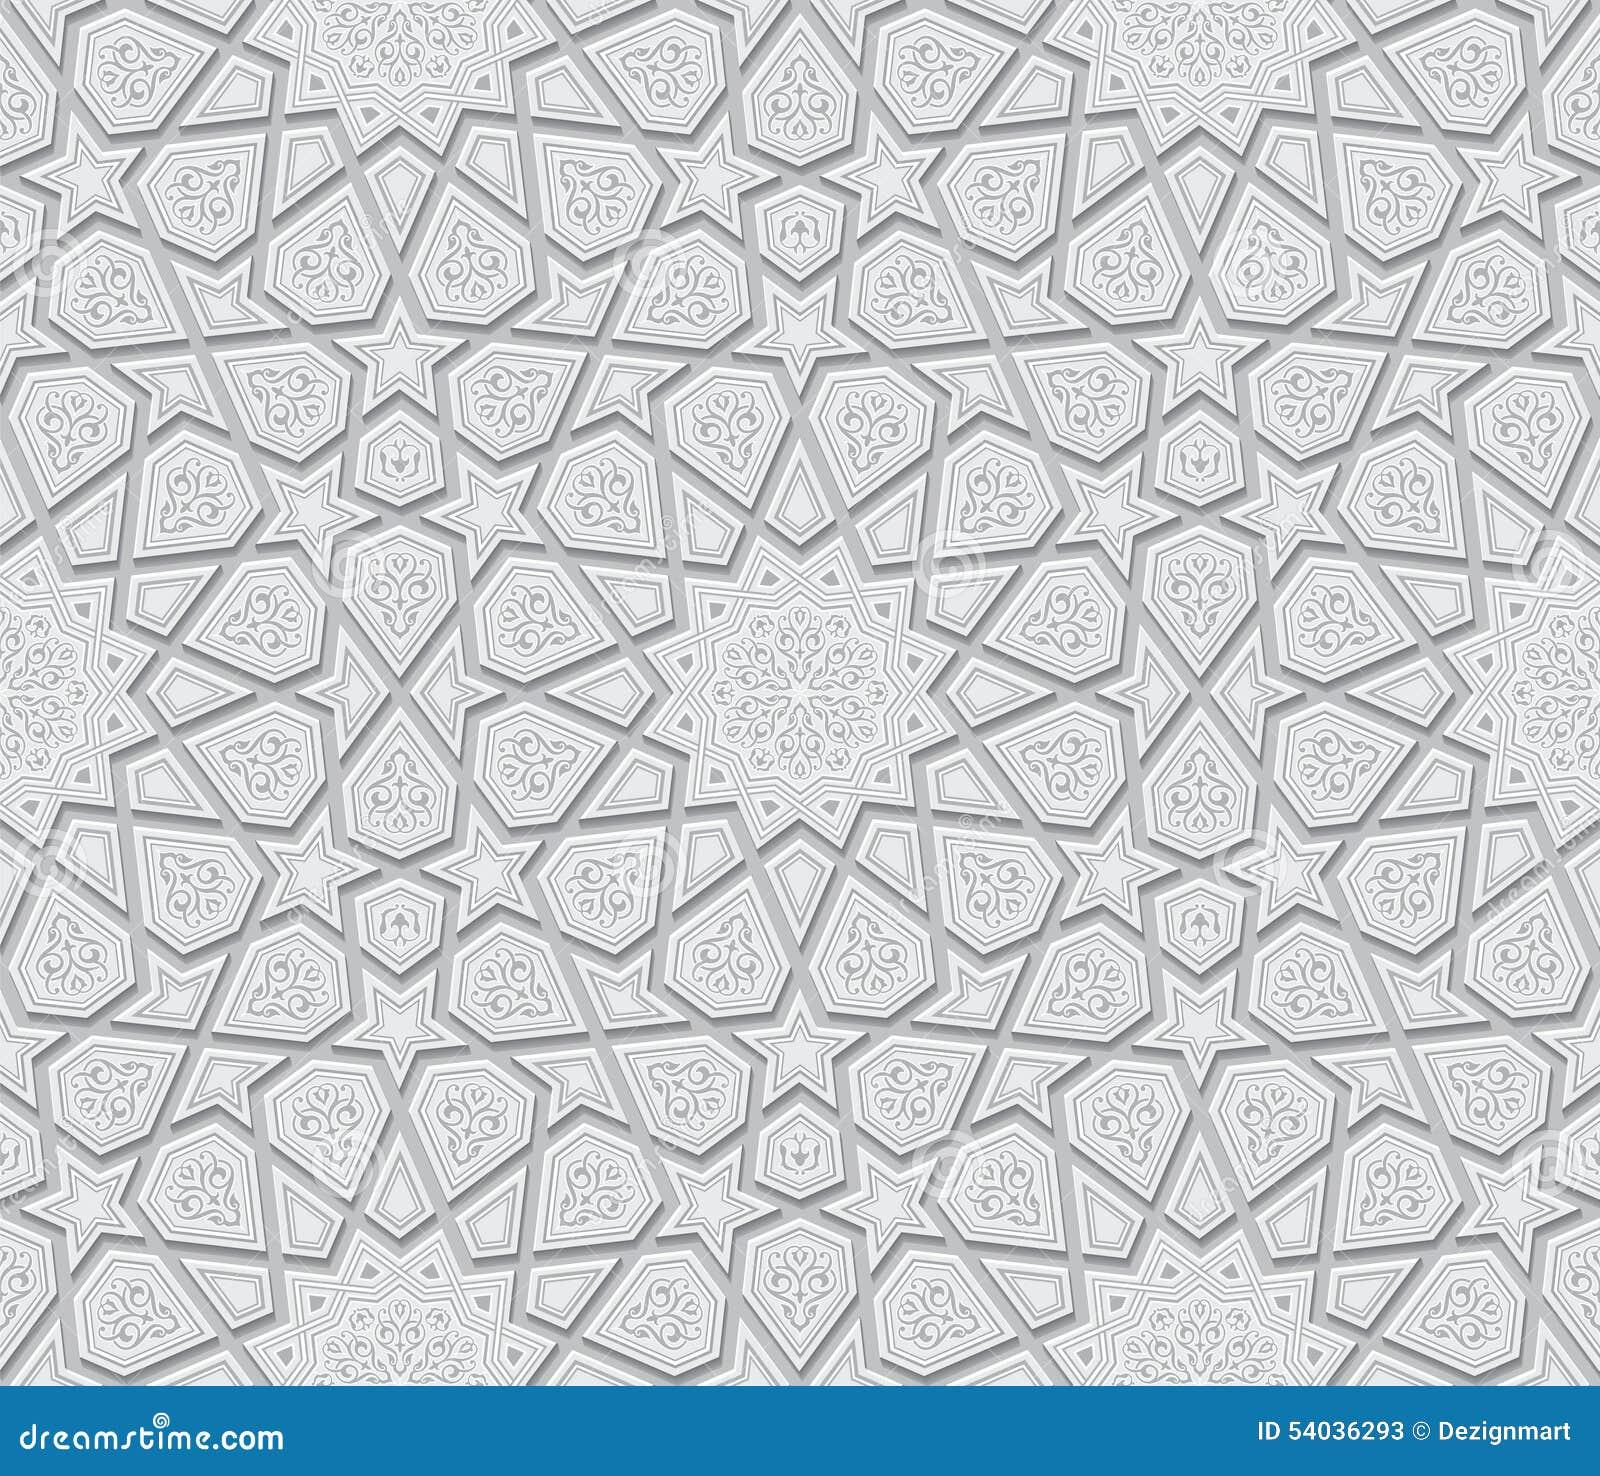 Islamic Star Ornament Light Grey Background Stock Vector ...